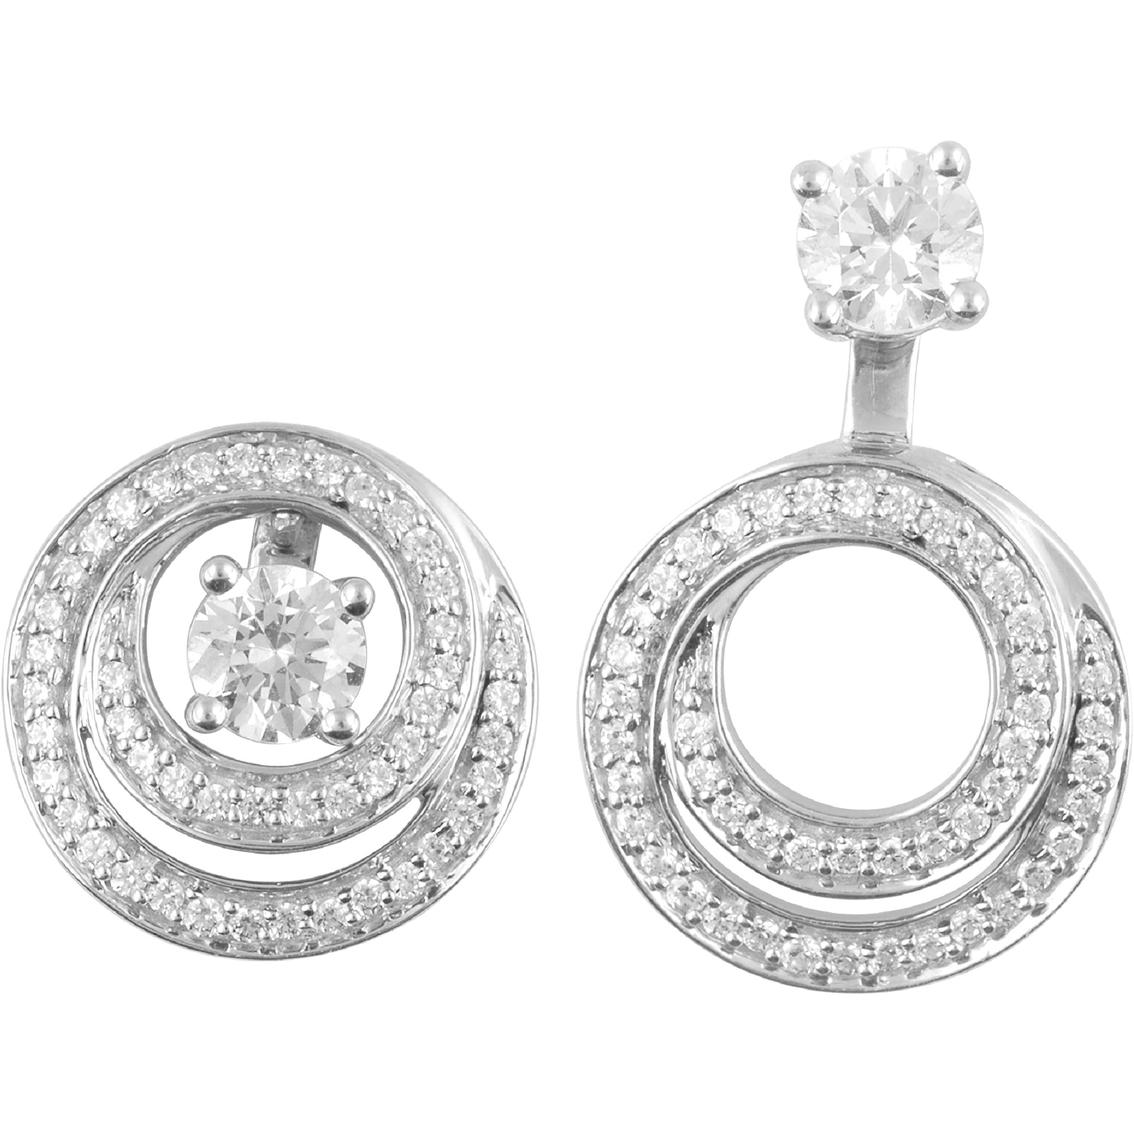 Earring Jackets For Diamond Studs